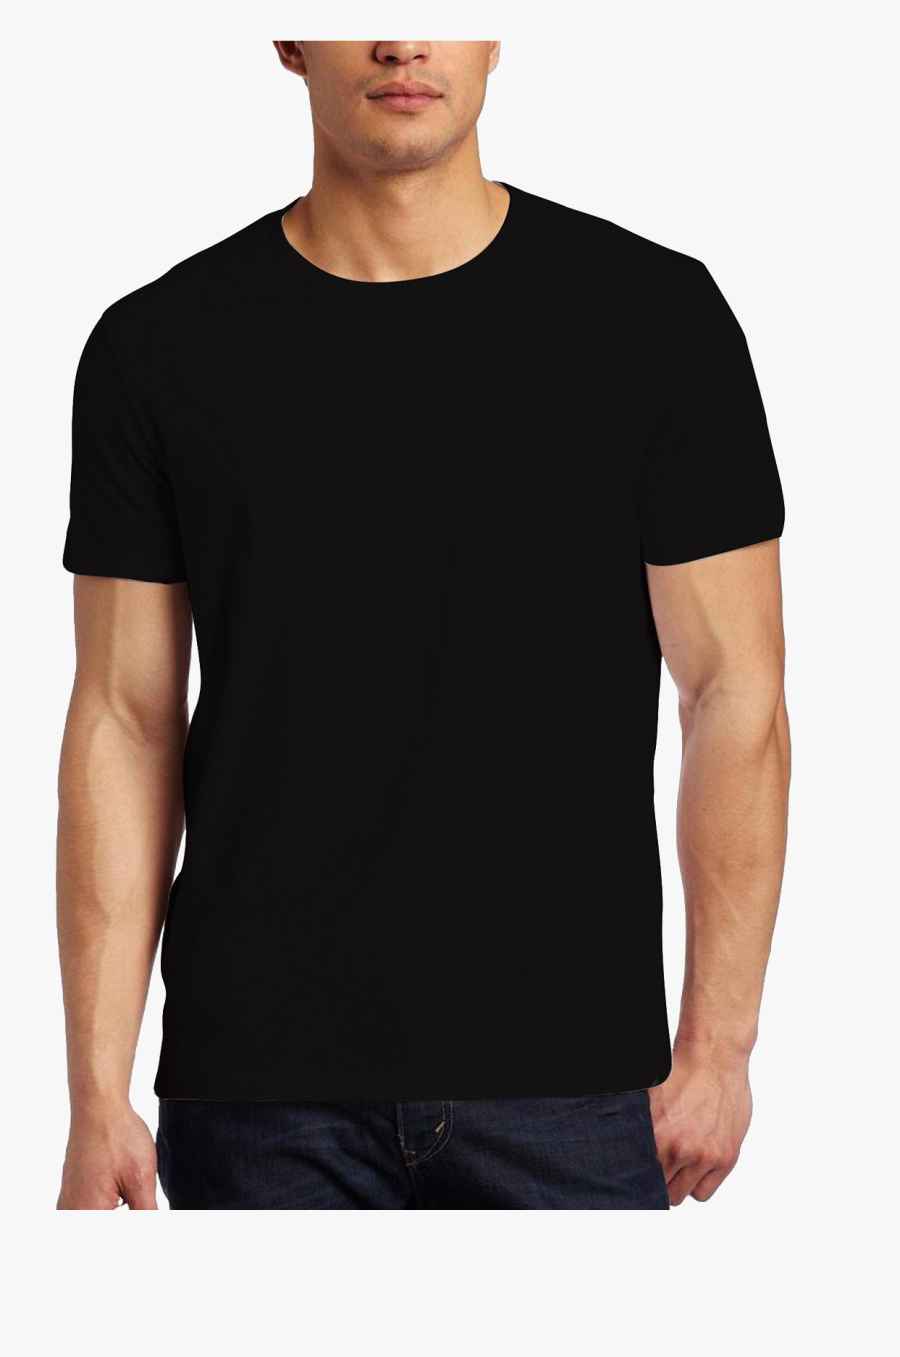 Black T-shirt Png Image Background - Real Black T Shirt Template, Transparent Clipart